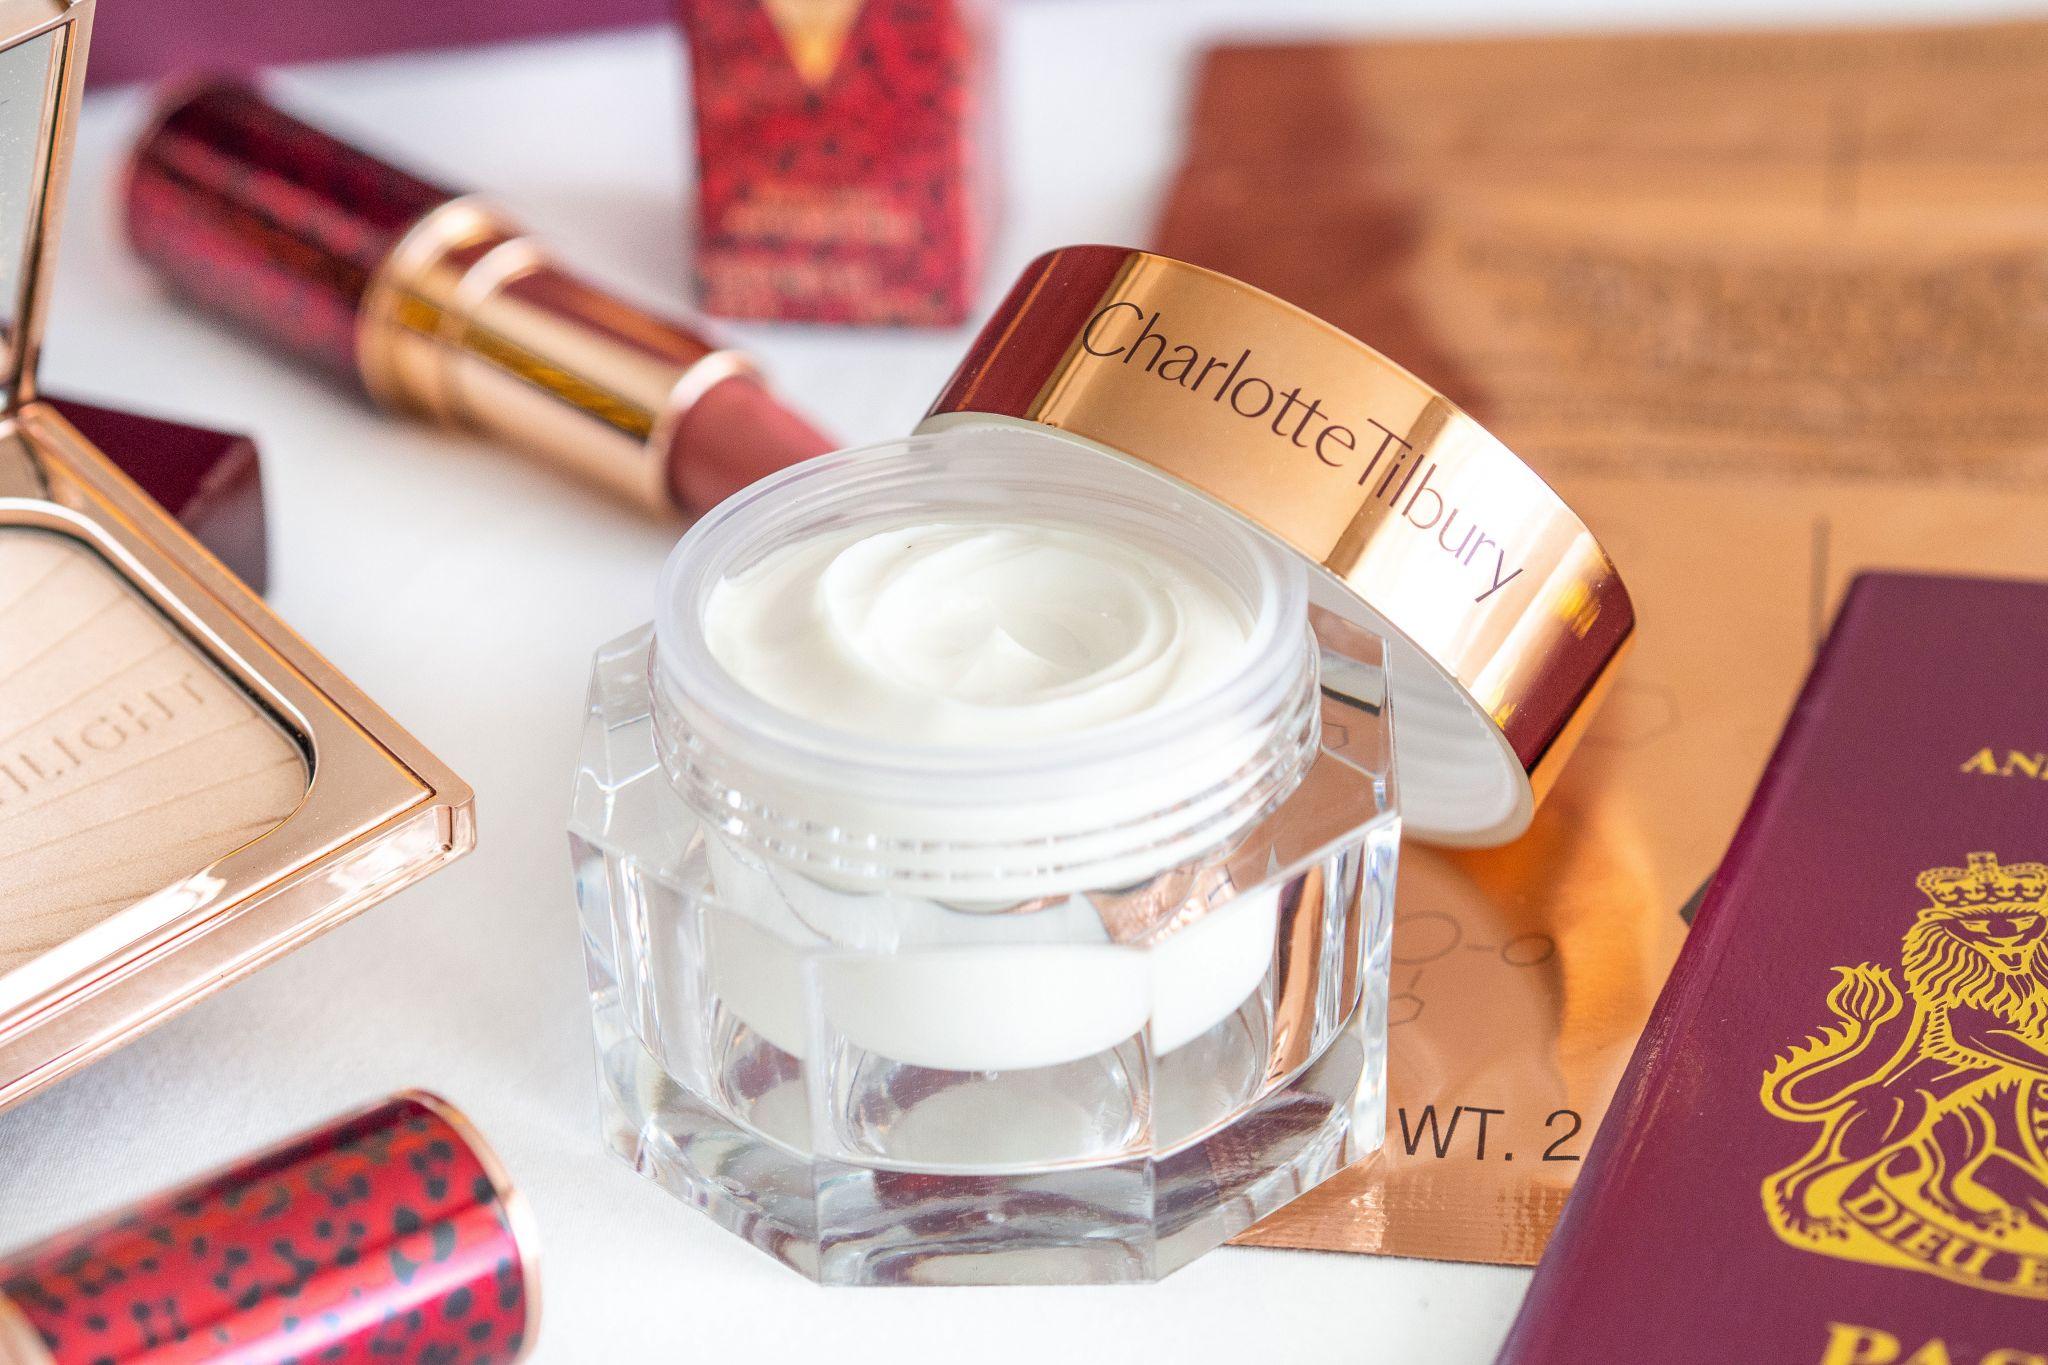 Charlotte's Magic Cream Review